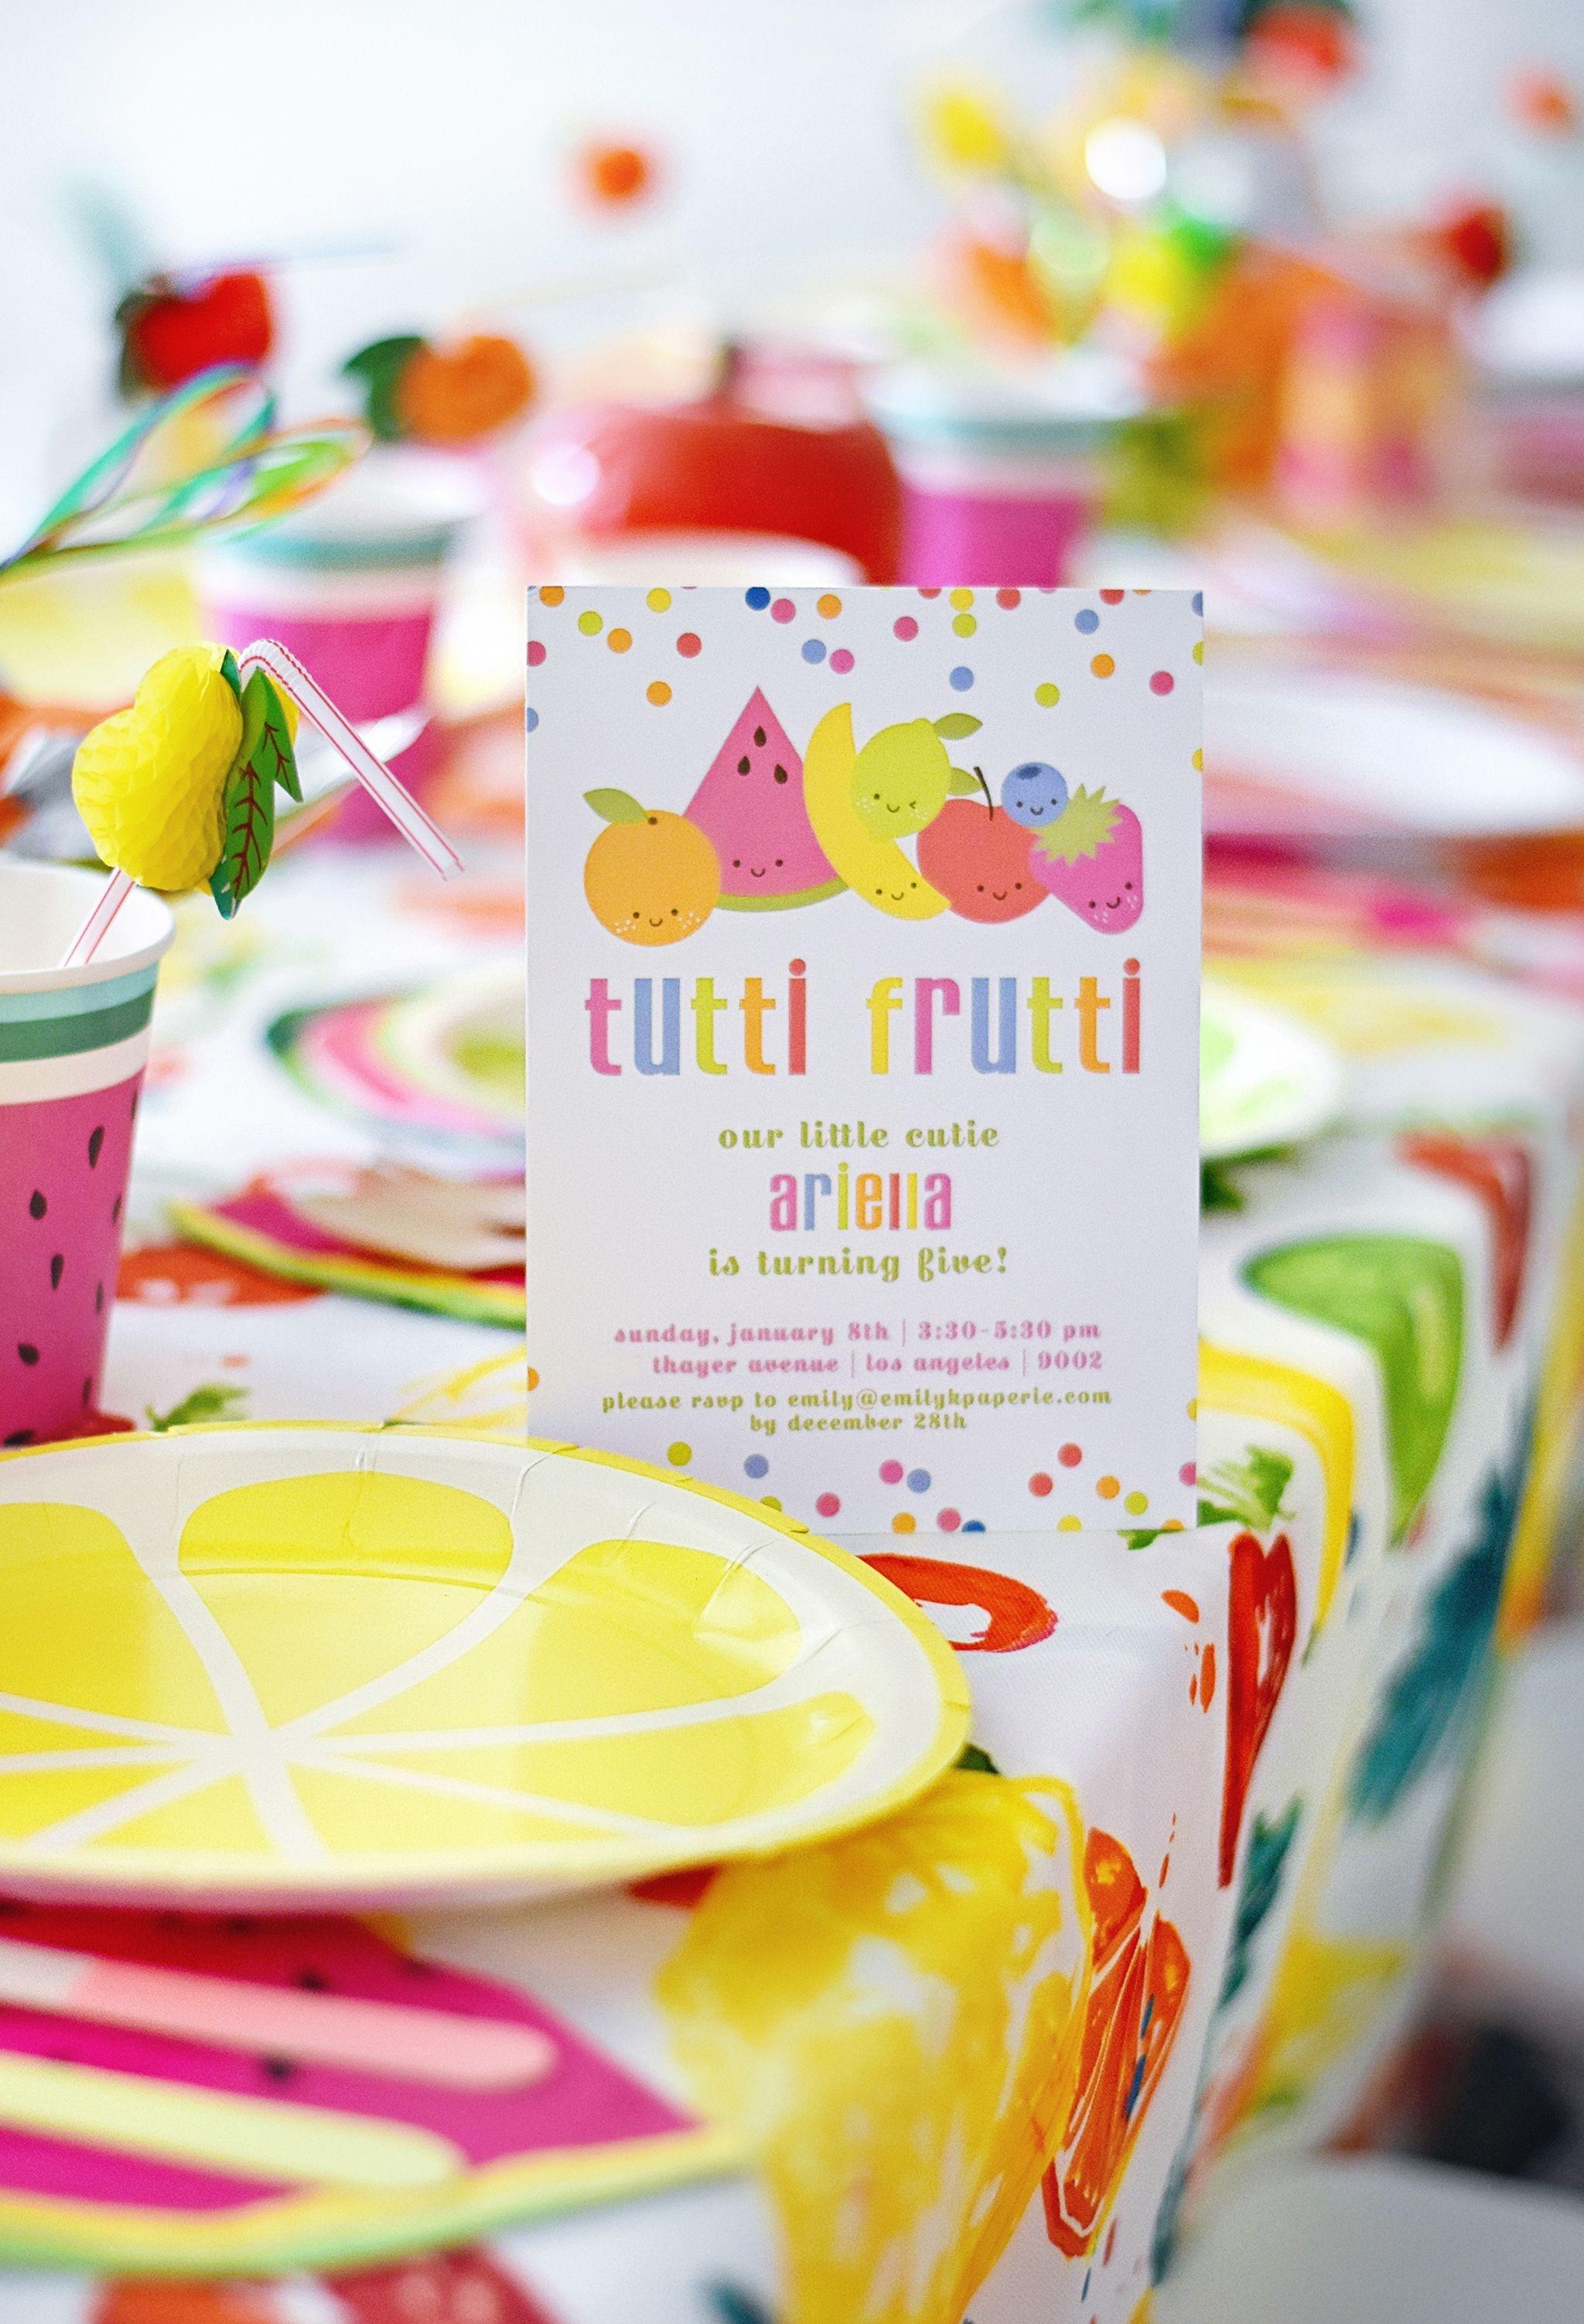 Cute And Colorful Tutti Frutti Birthday Party | Free Printables - Tutti Frutti Free Printables